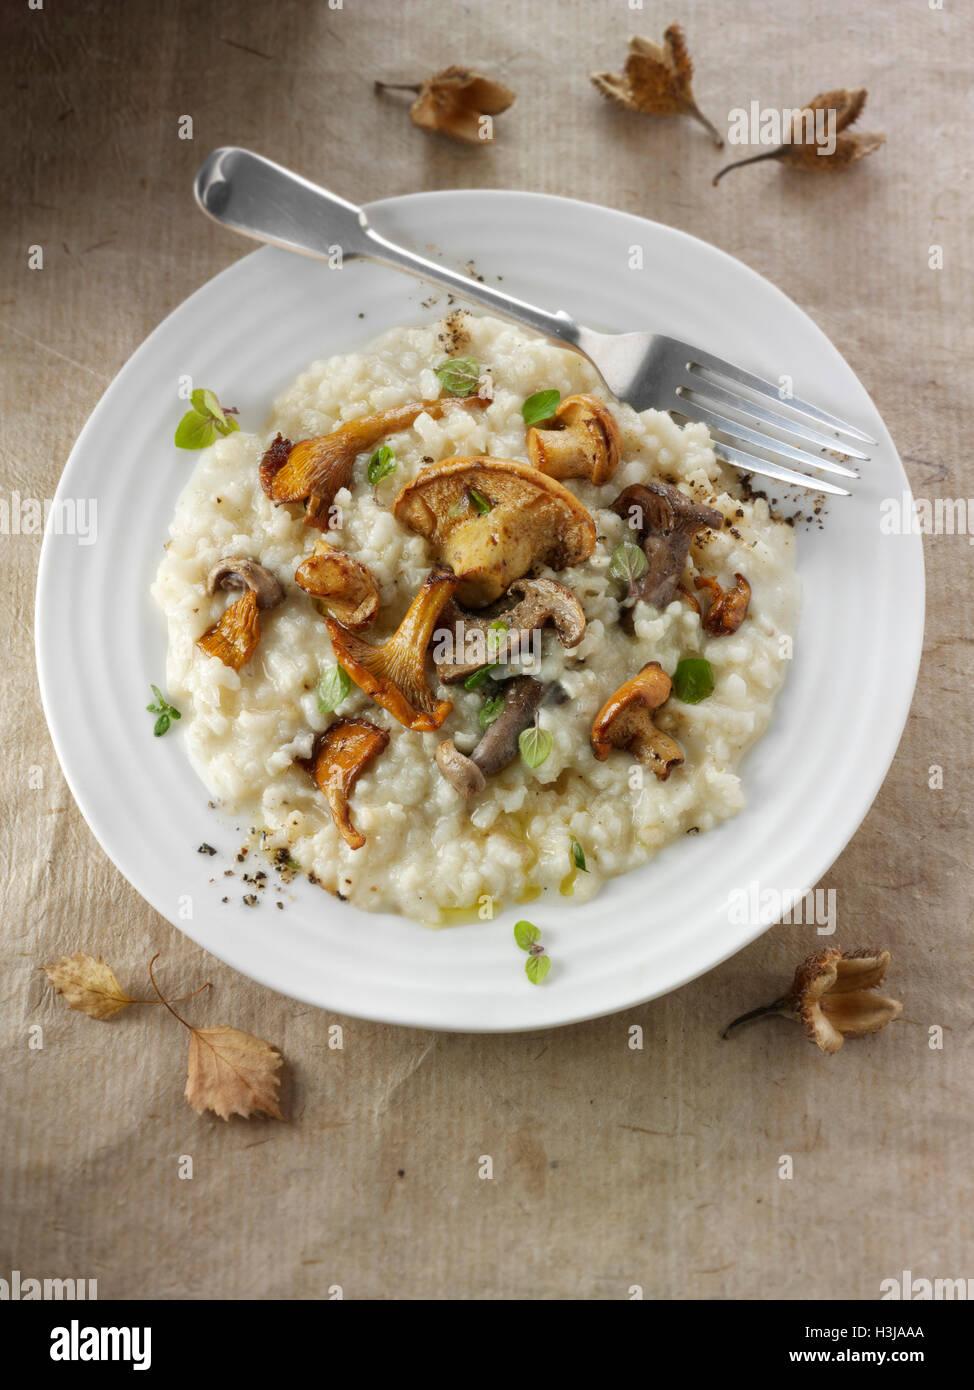 Wiild Pfifferlinge oder Girolle, Pied de Mouton Pilze oder Igel, Pied Bleu oder blau Fuß Musrooms mit Nudeln Stockbild